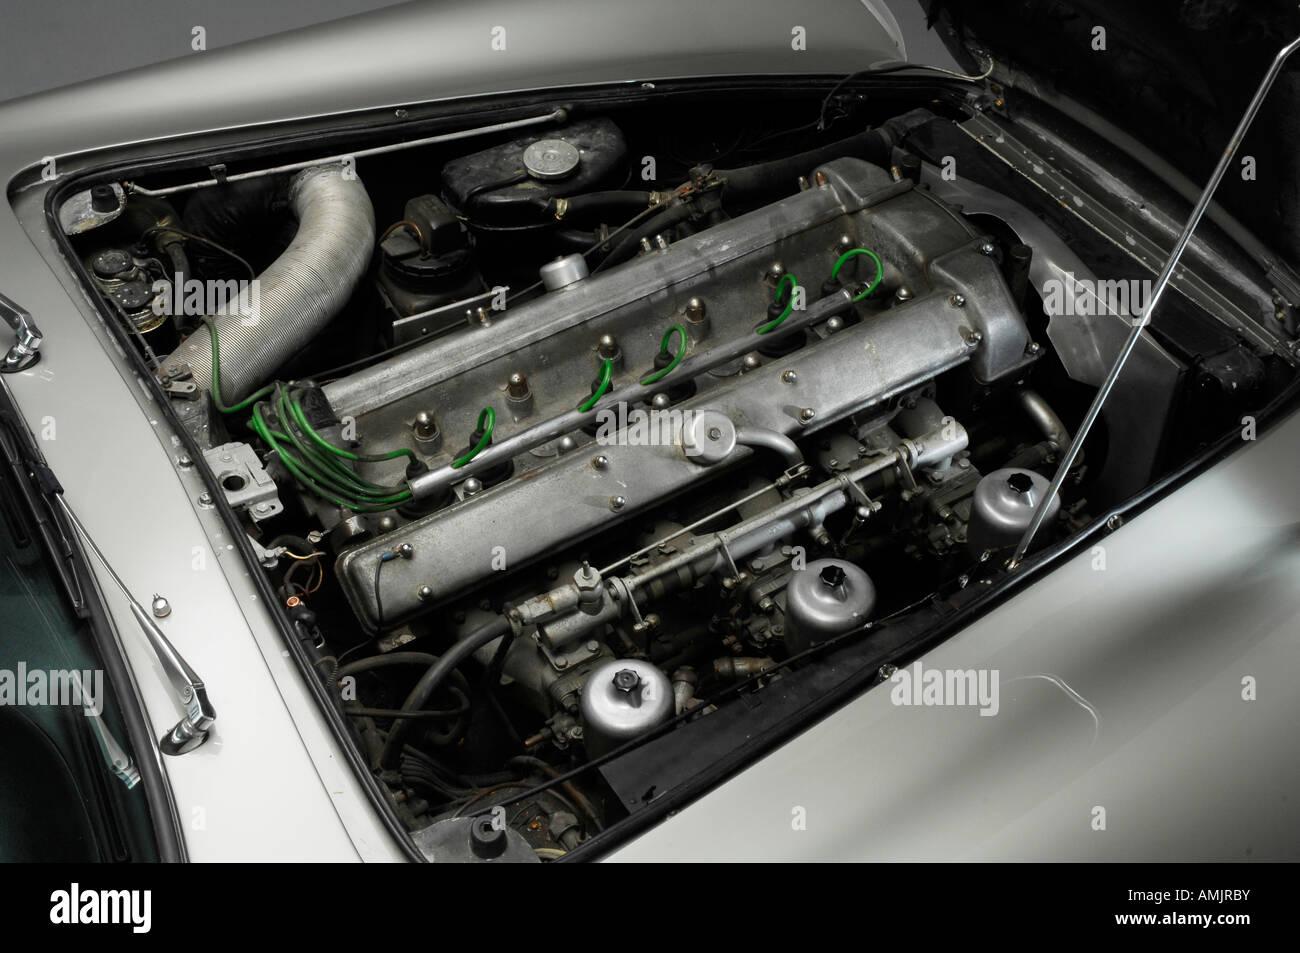 1964 Aston Martin Db5 Engine Stock Photo Alamy